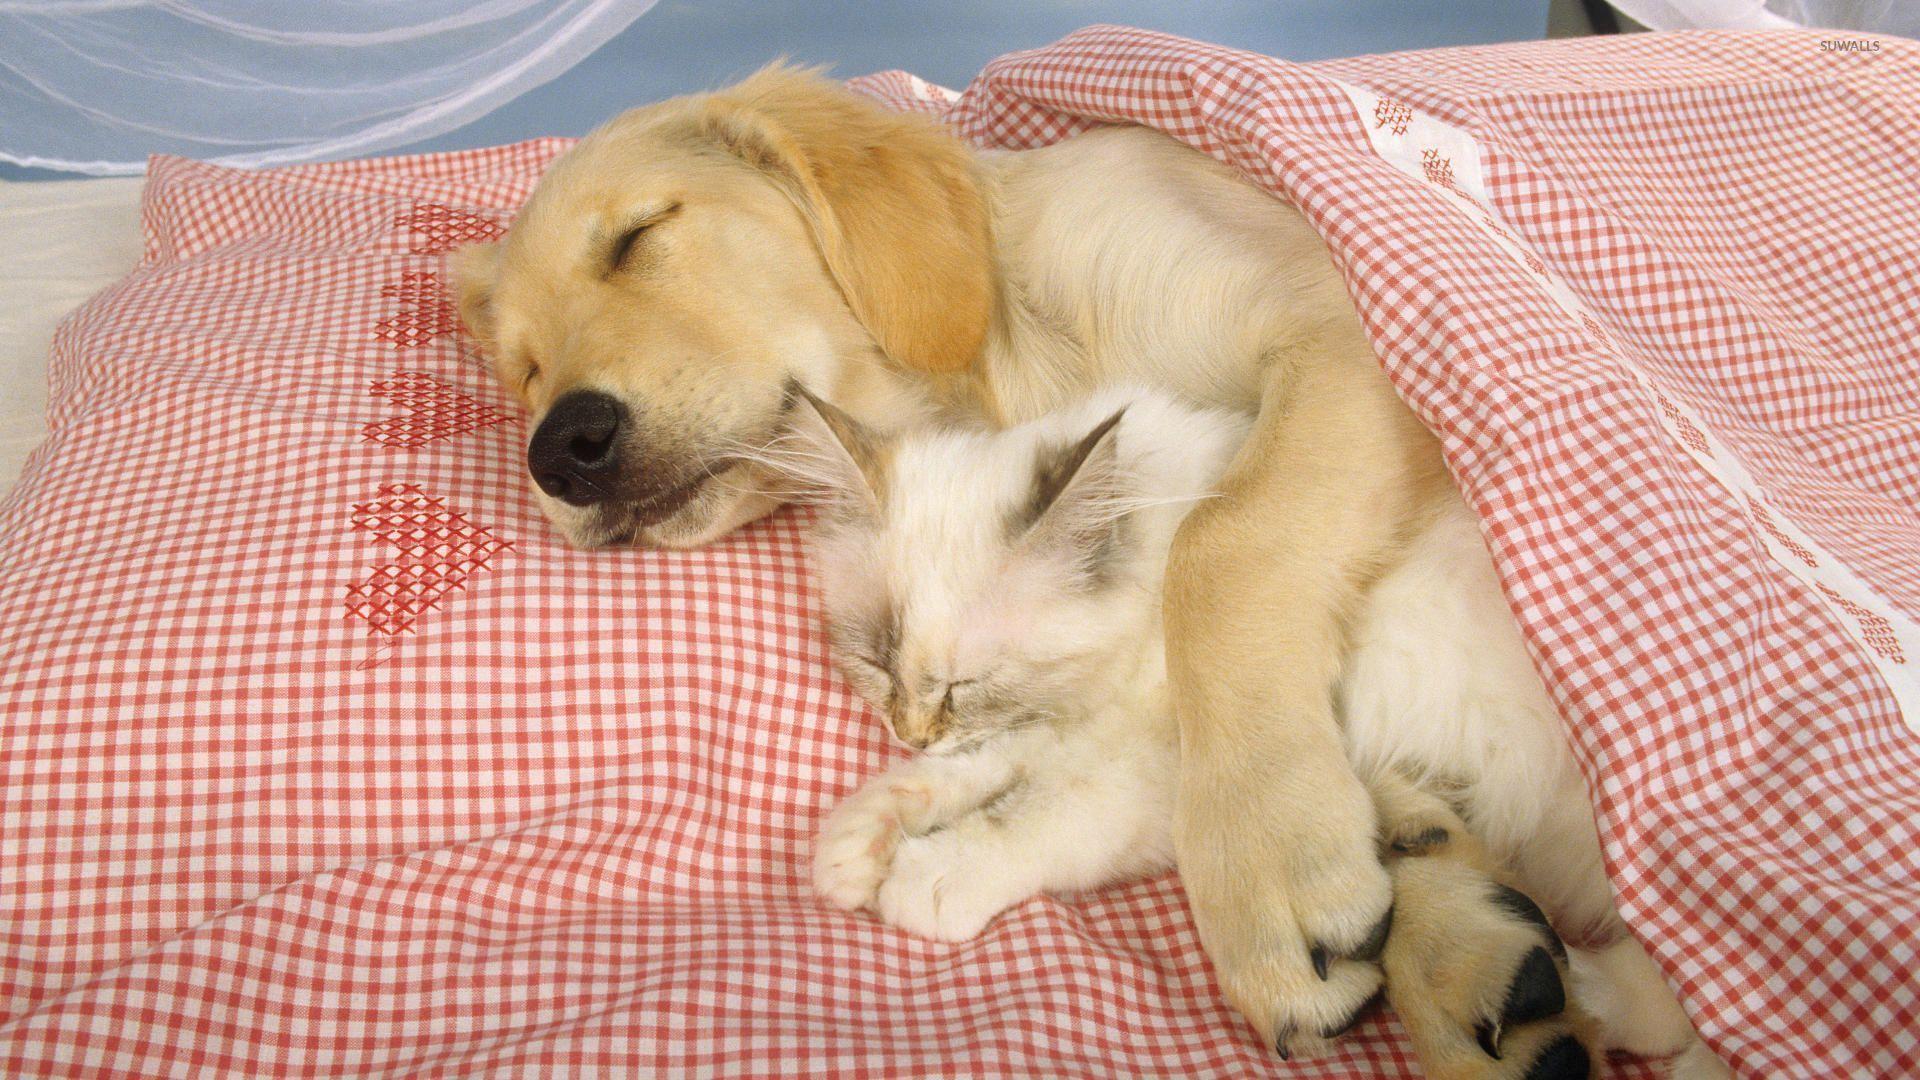 Sleeping dog holding a cute kitten wallpaper - Animal ...